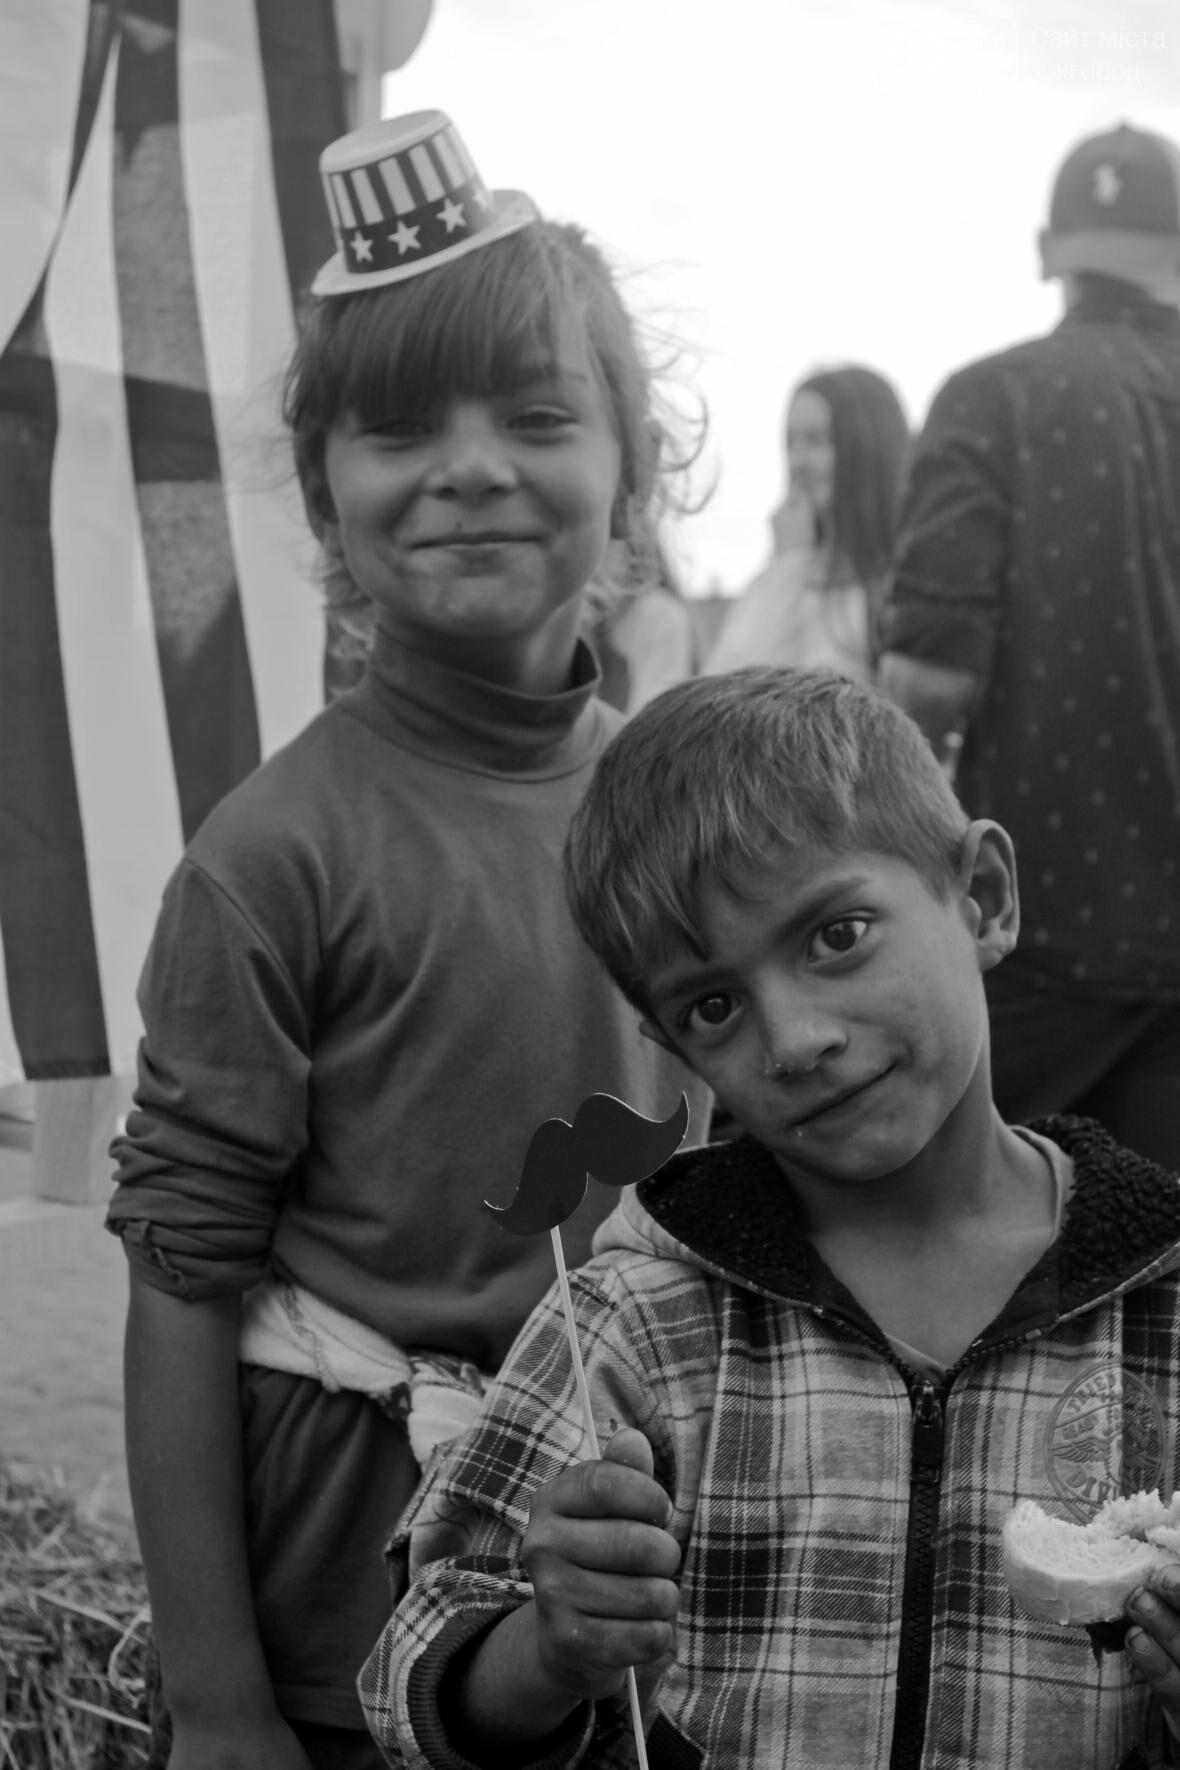 Ужгород говорив мовою сердець: на Театральній пройшло мультикультурне свято (ФОТОРЕПОРТАЖ), фото-13